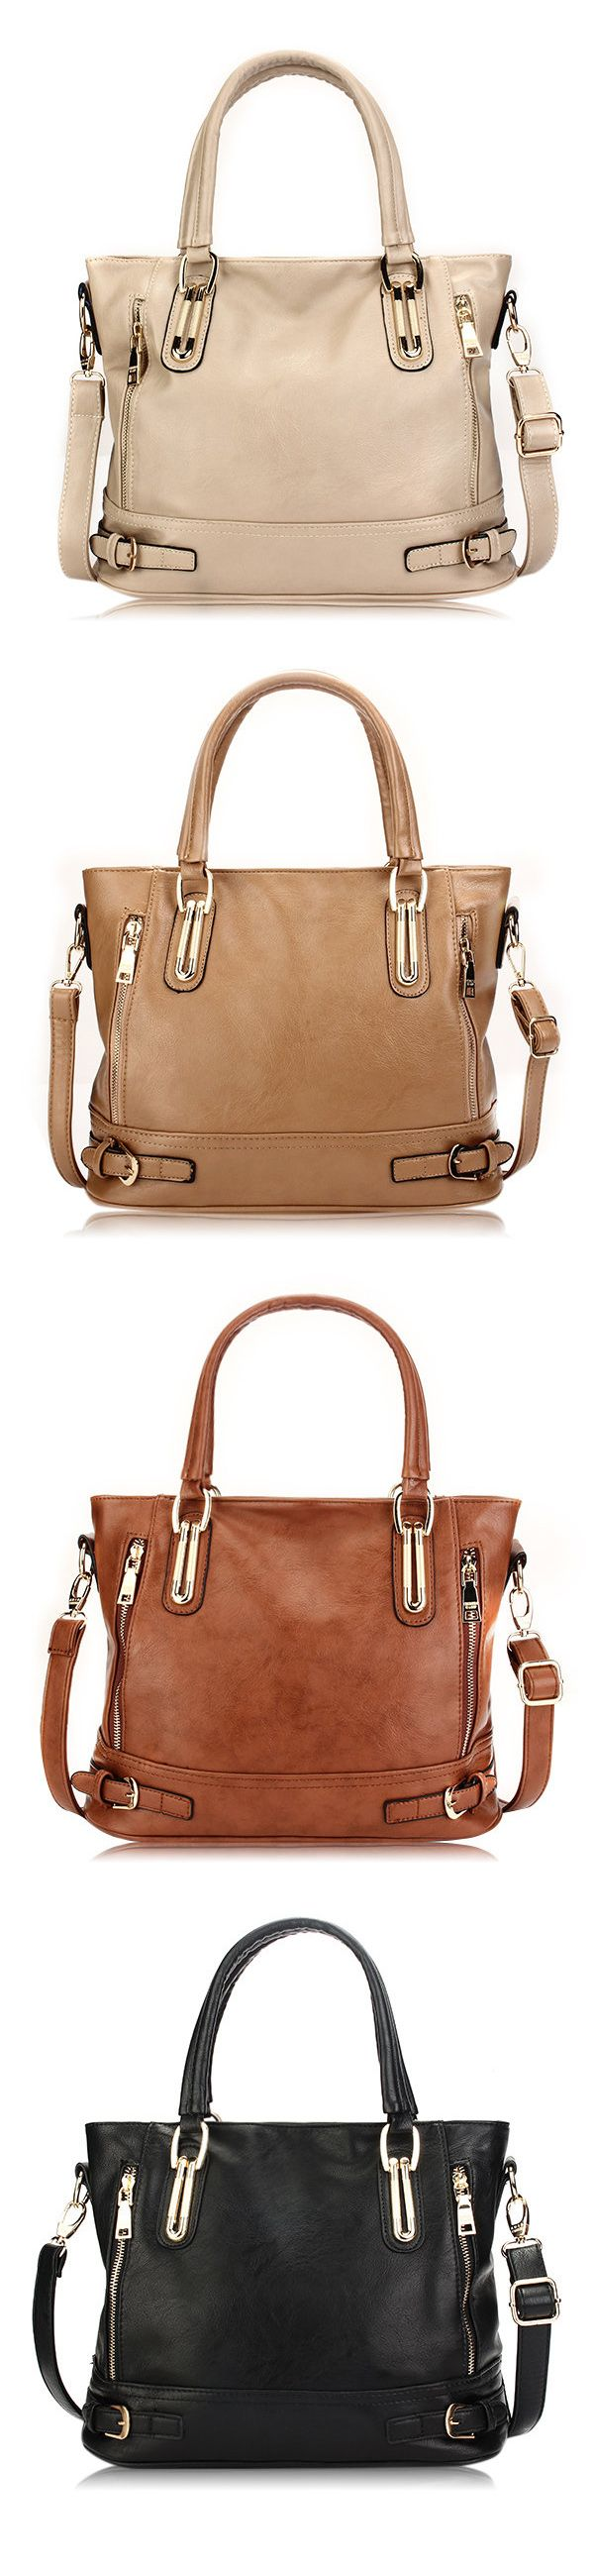 US$29.98  Women Vintage Side-Zipper Bucket Shoulder Bag Ladies Brown Handbag